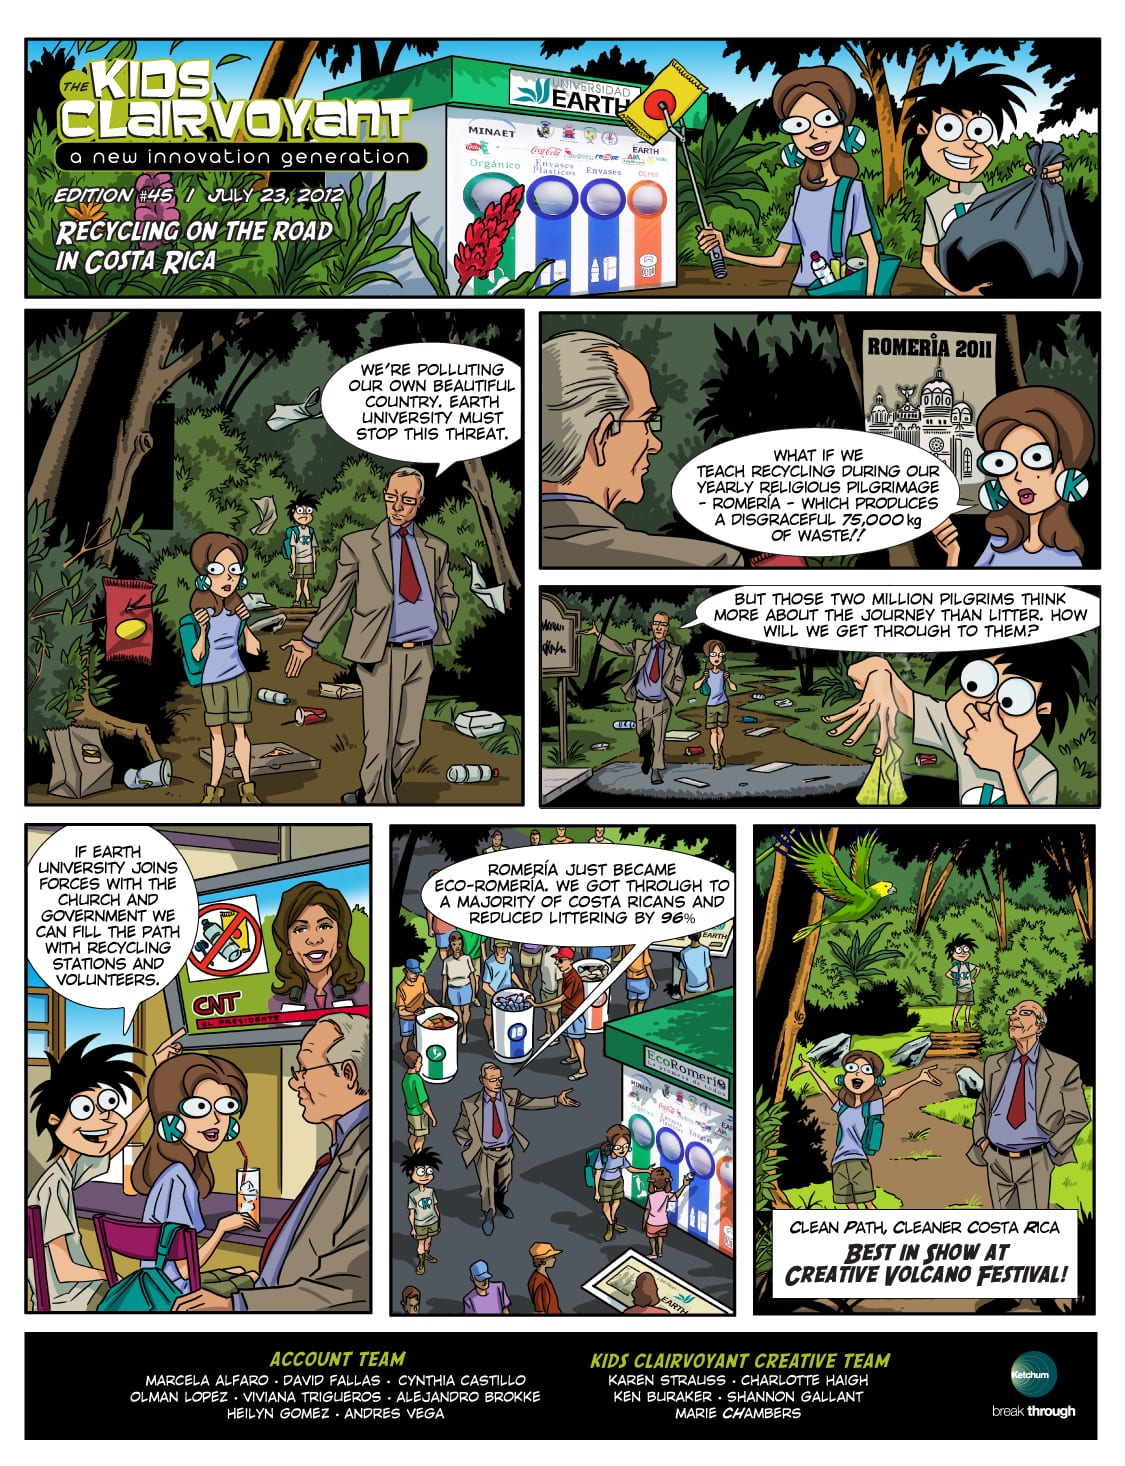 Kids Clairvoyant Comic Strip